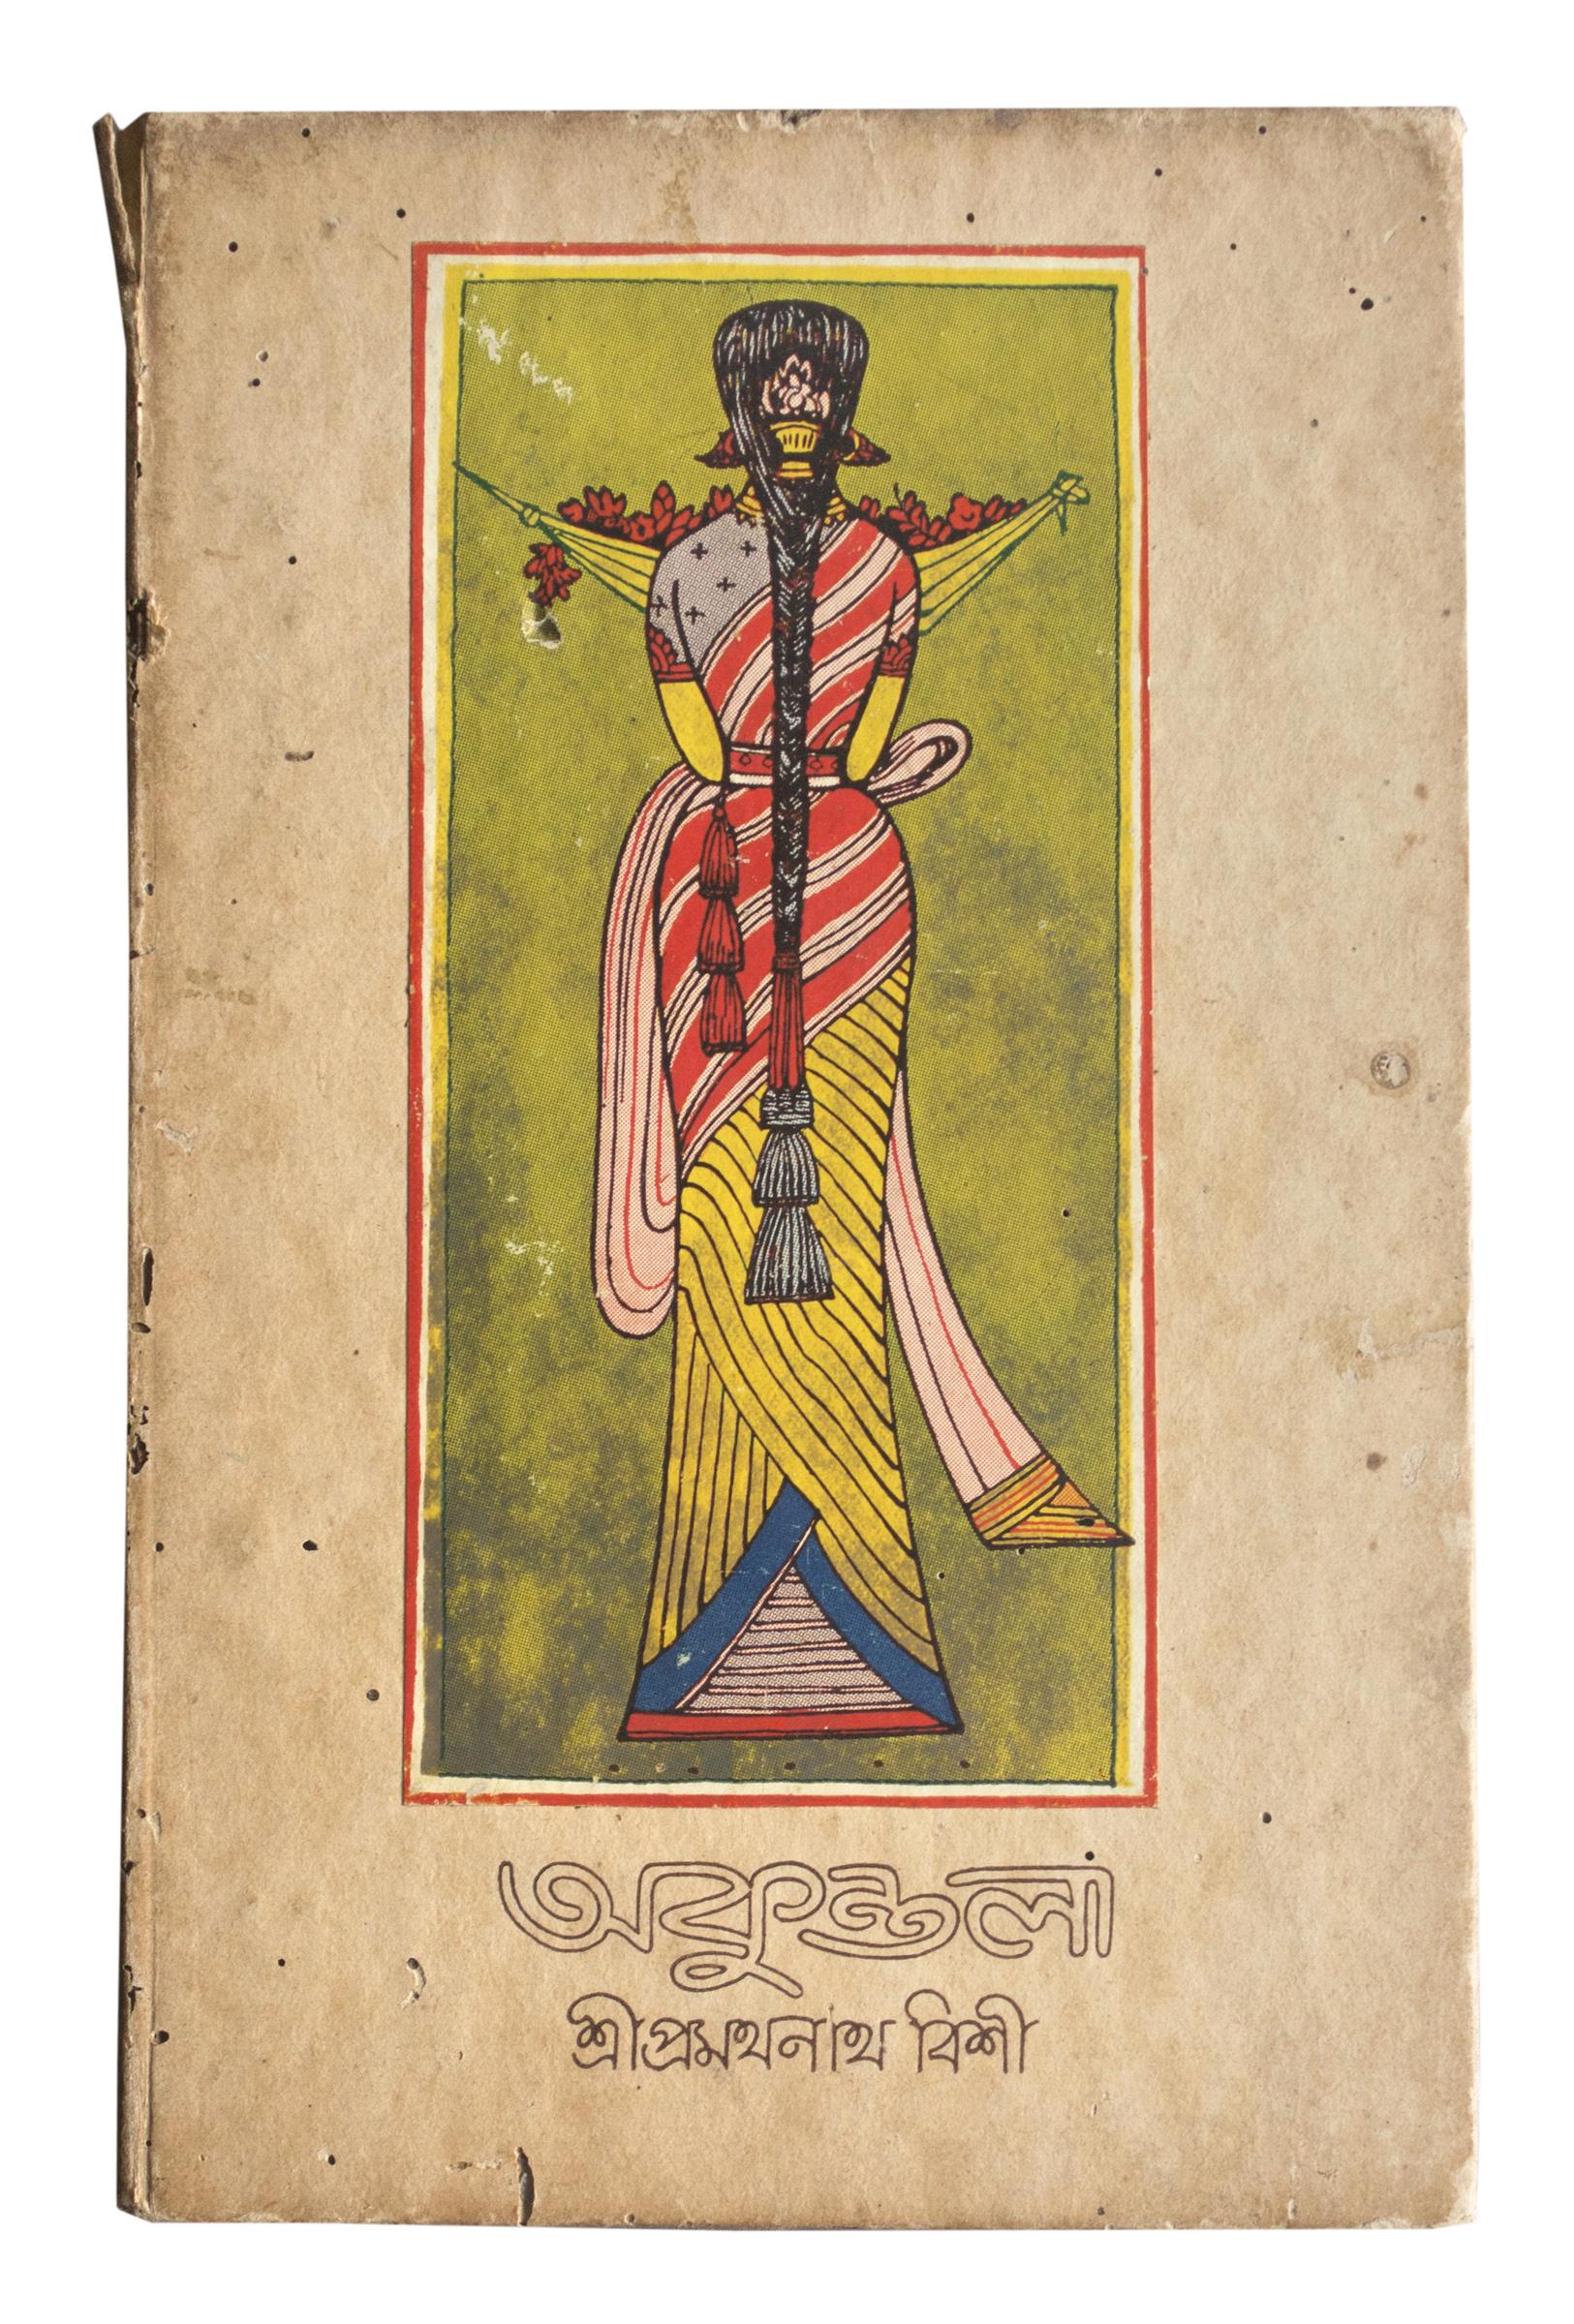 Akuntala (Collection of poems in Bengali) by Pramathanath Bisi